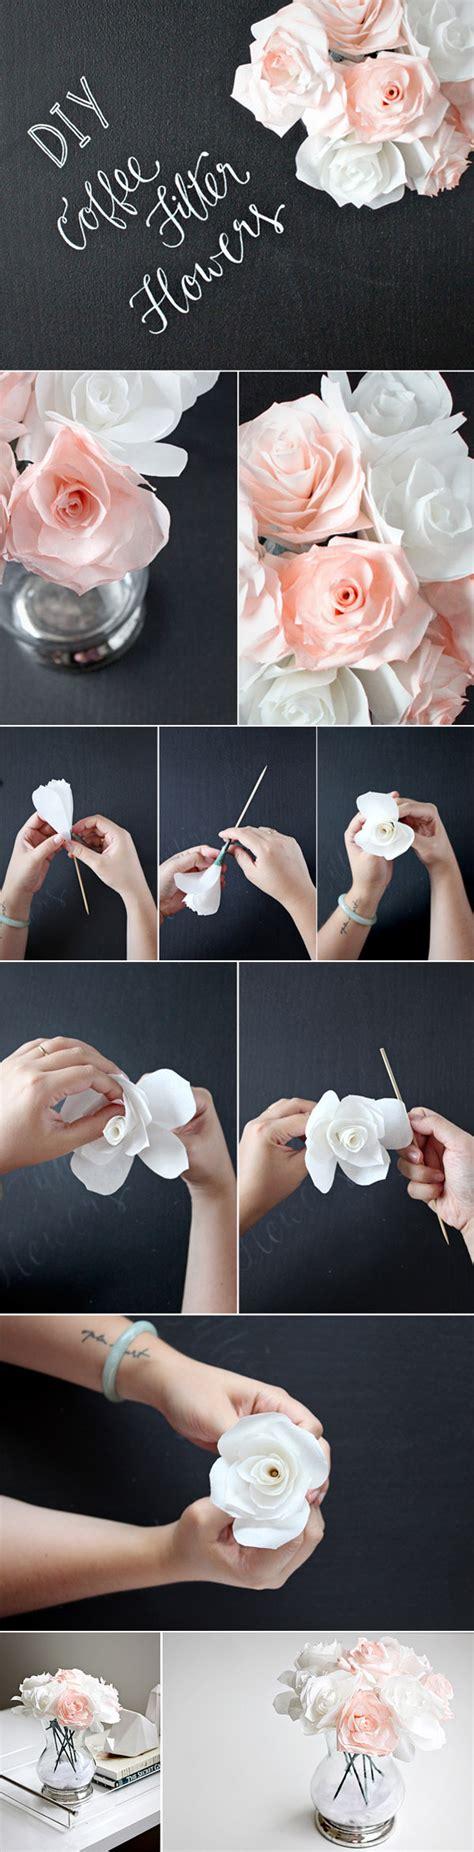 Diy Wedding Flower Ideas by 10 Creative Diy Wedding Centerpieces With Tutorials